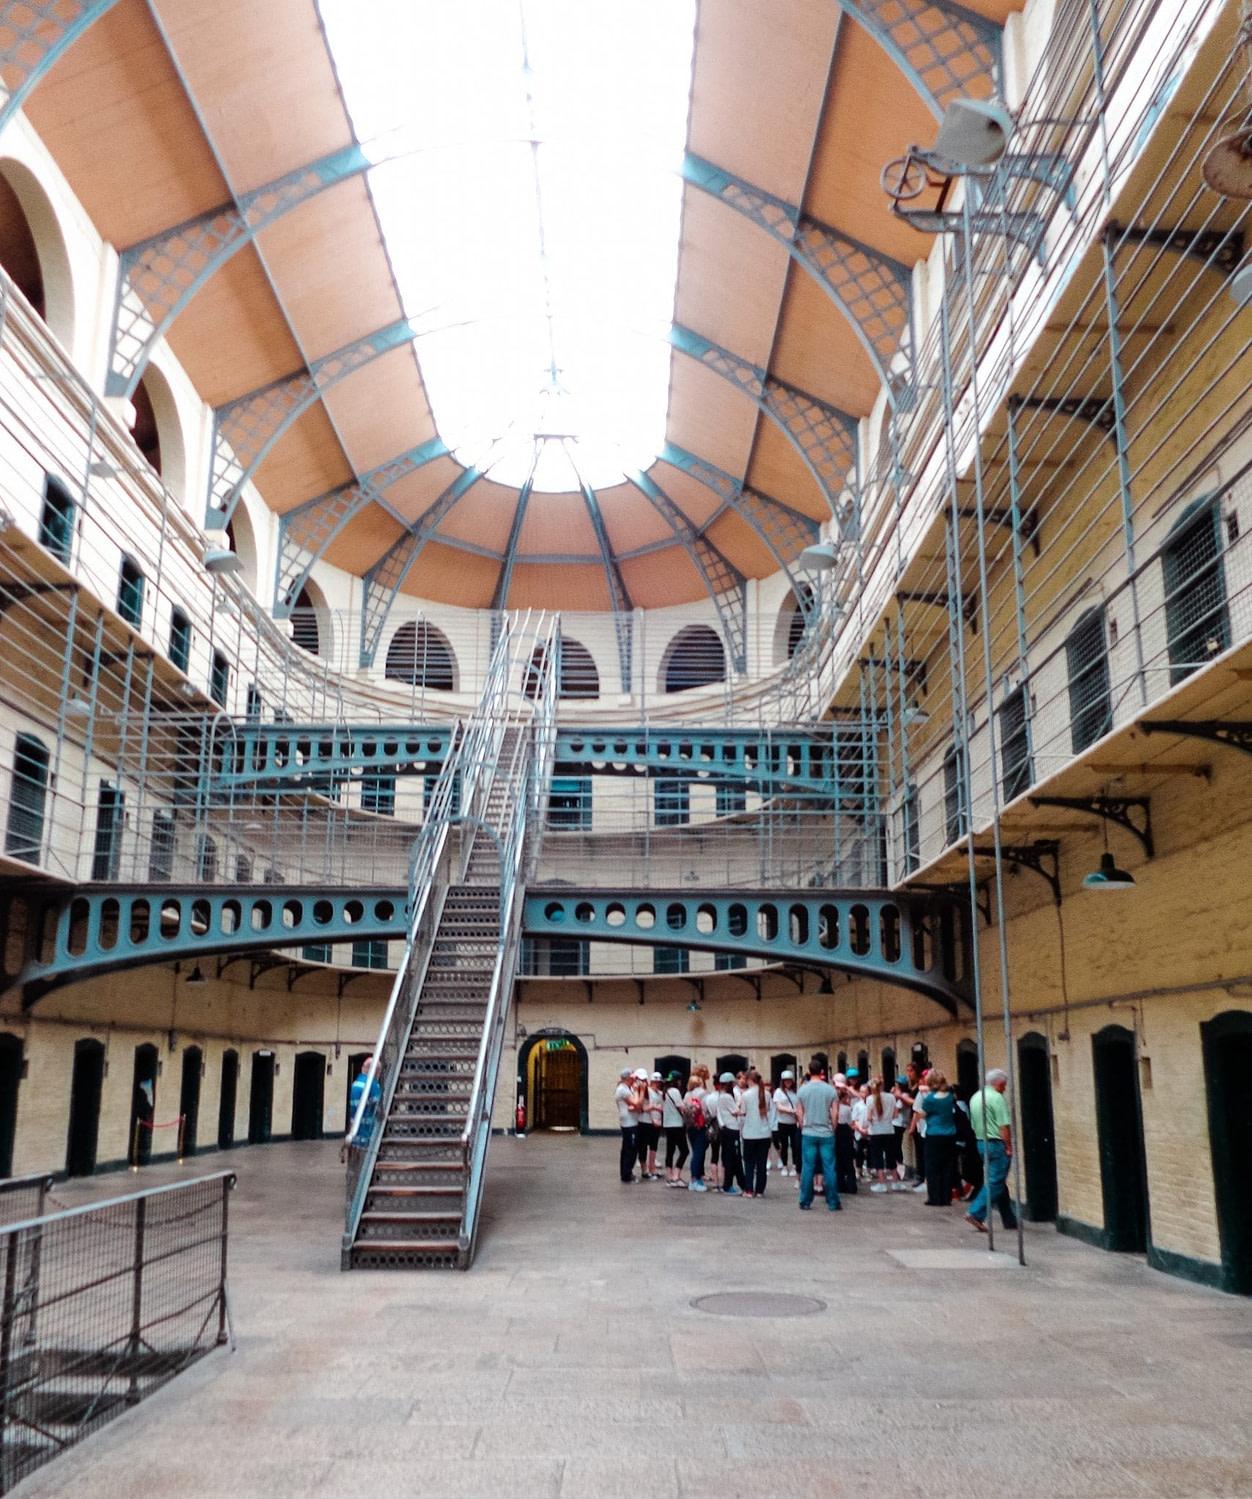 Kilmainham Gaol 2 days in dublin